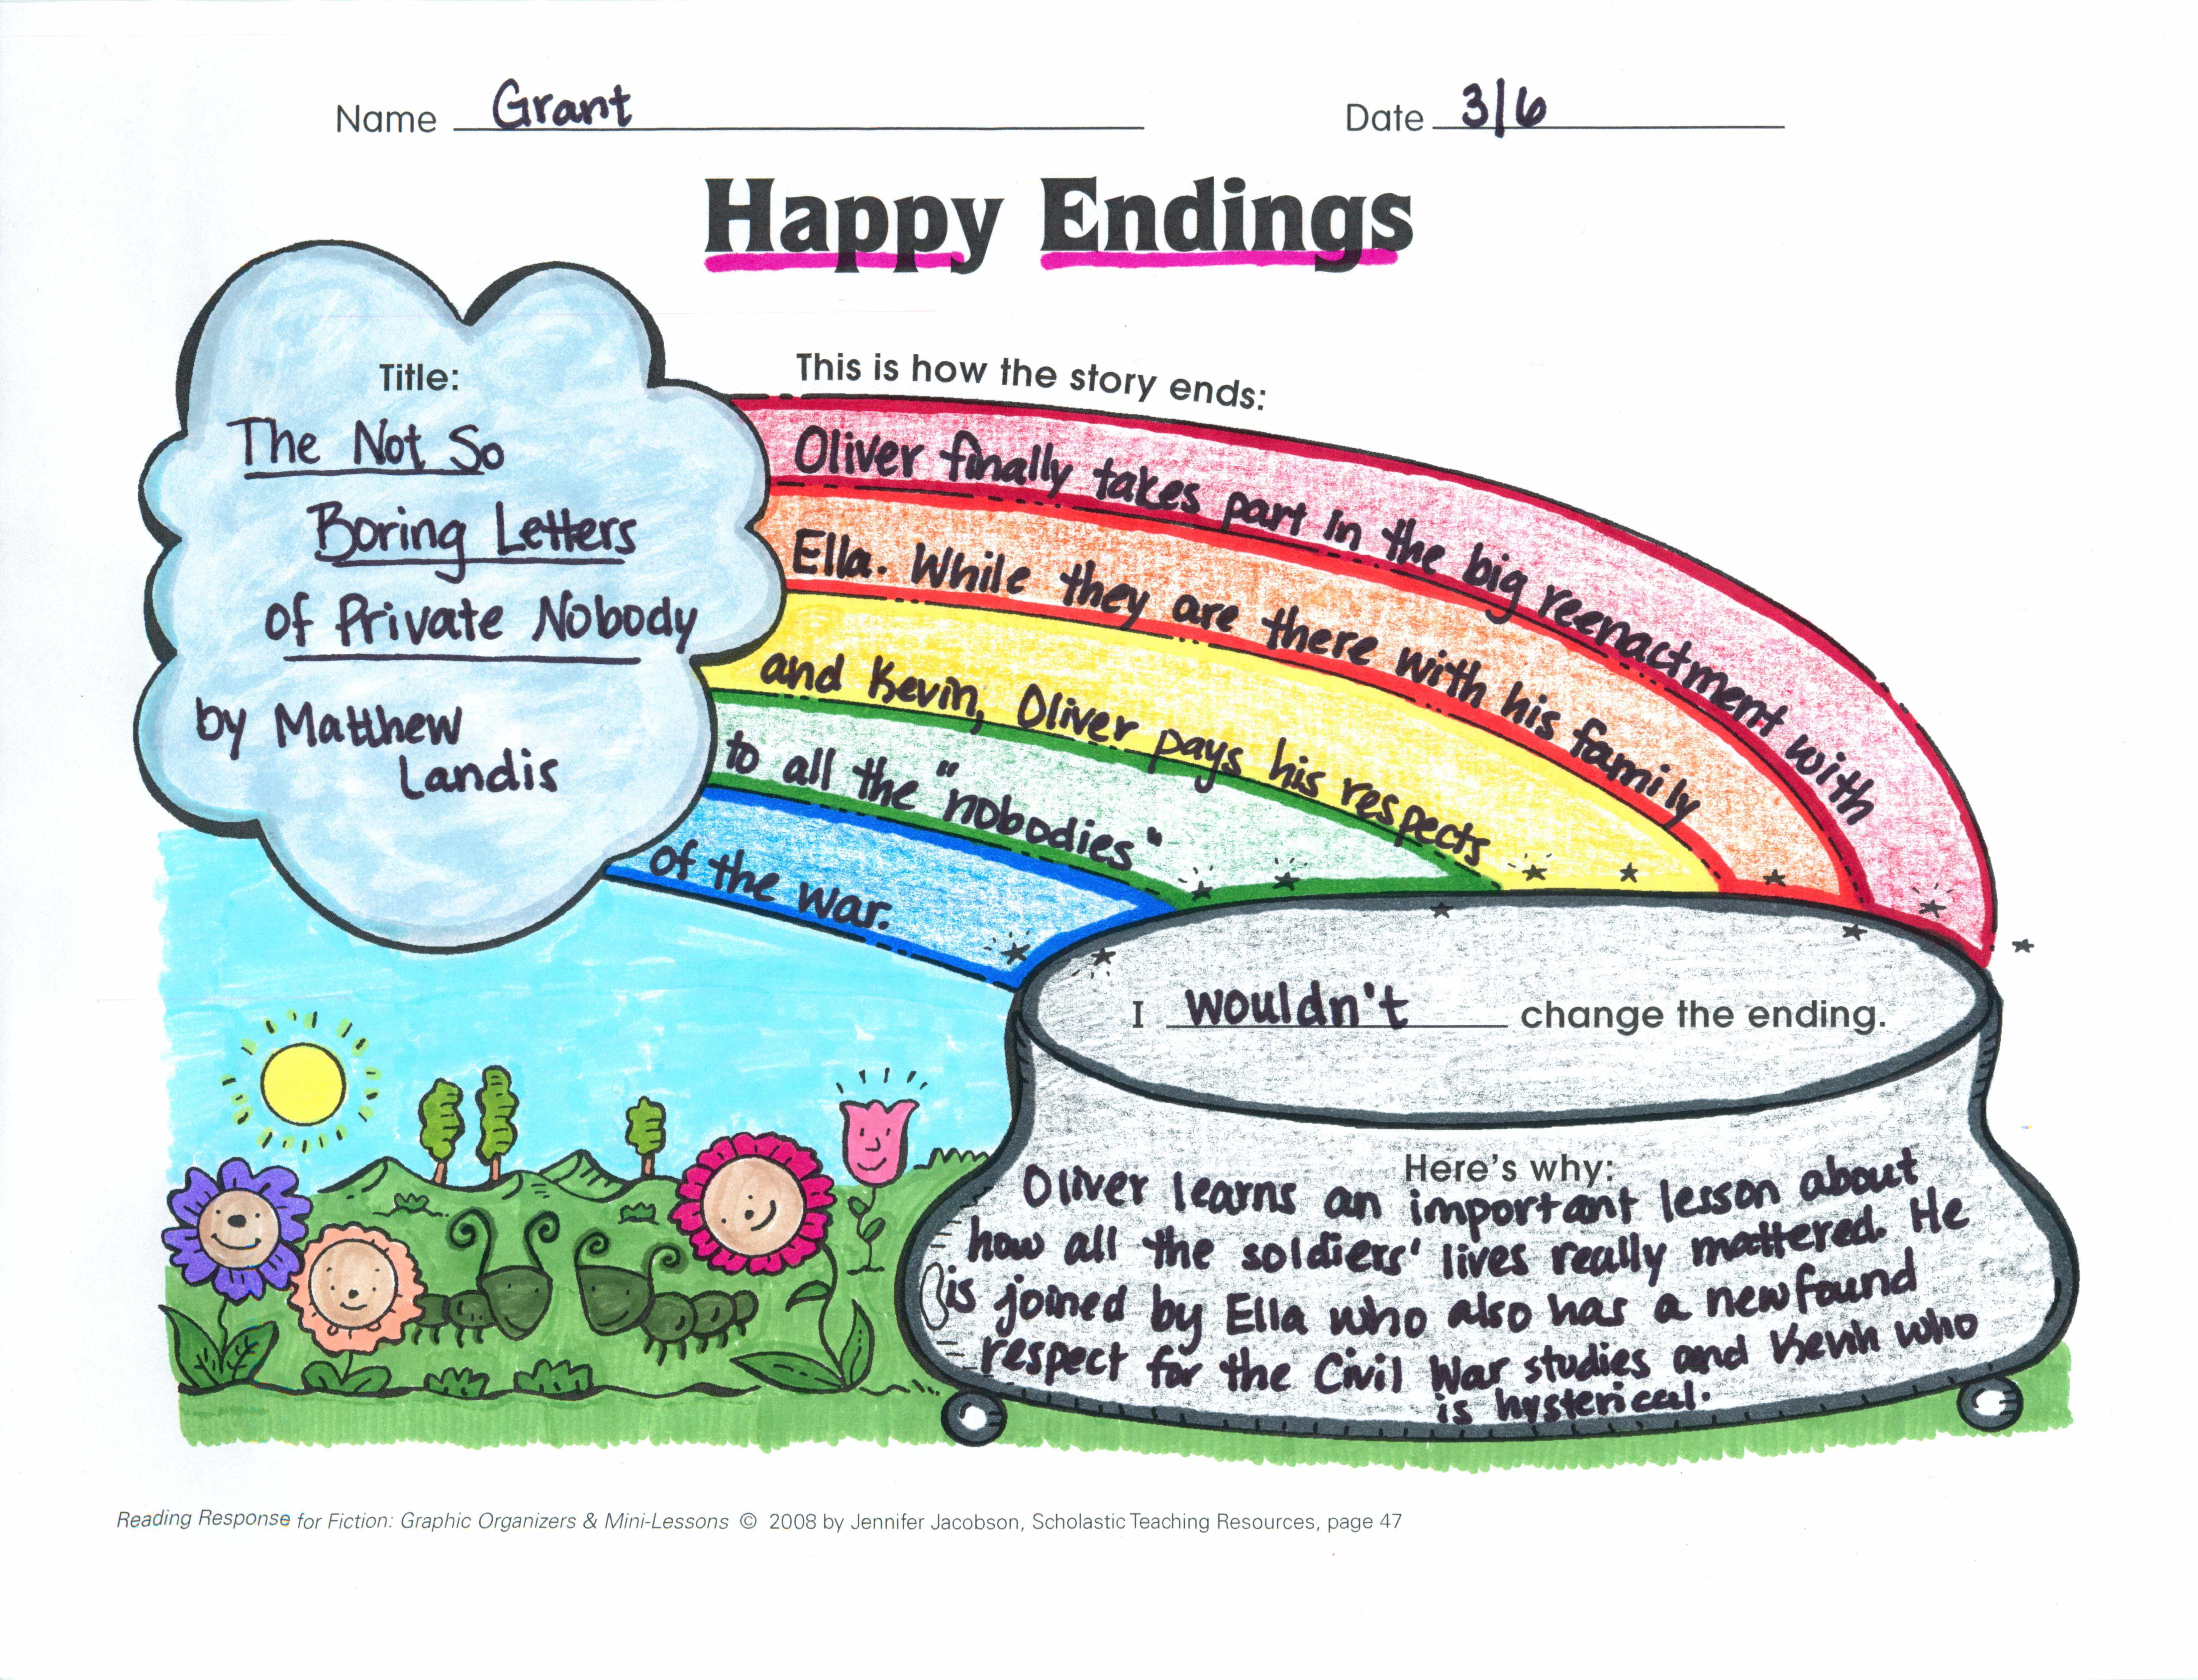 Happy Endings Analyzing Story Endings Graphic Organizer Rl 2 5 Rl 3 3 Rl 4 1 W 2 1 W 3 1 A W 3 1 B W 3 1 D W Graphic Organizers Happy Endings Lesson